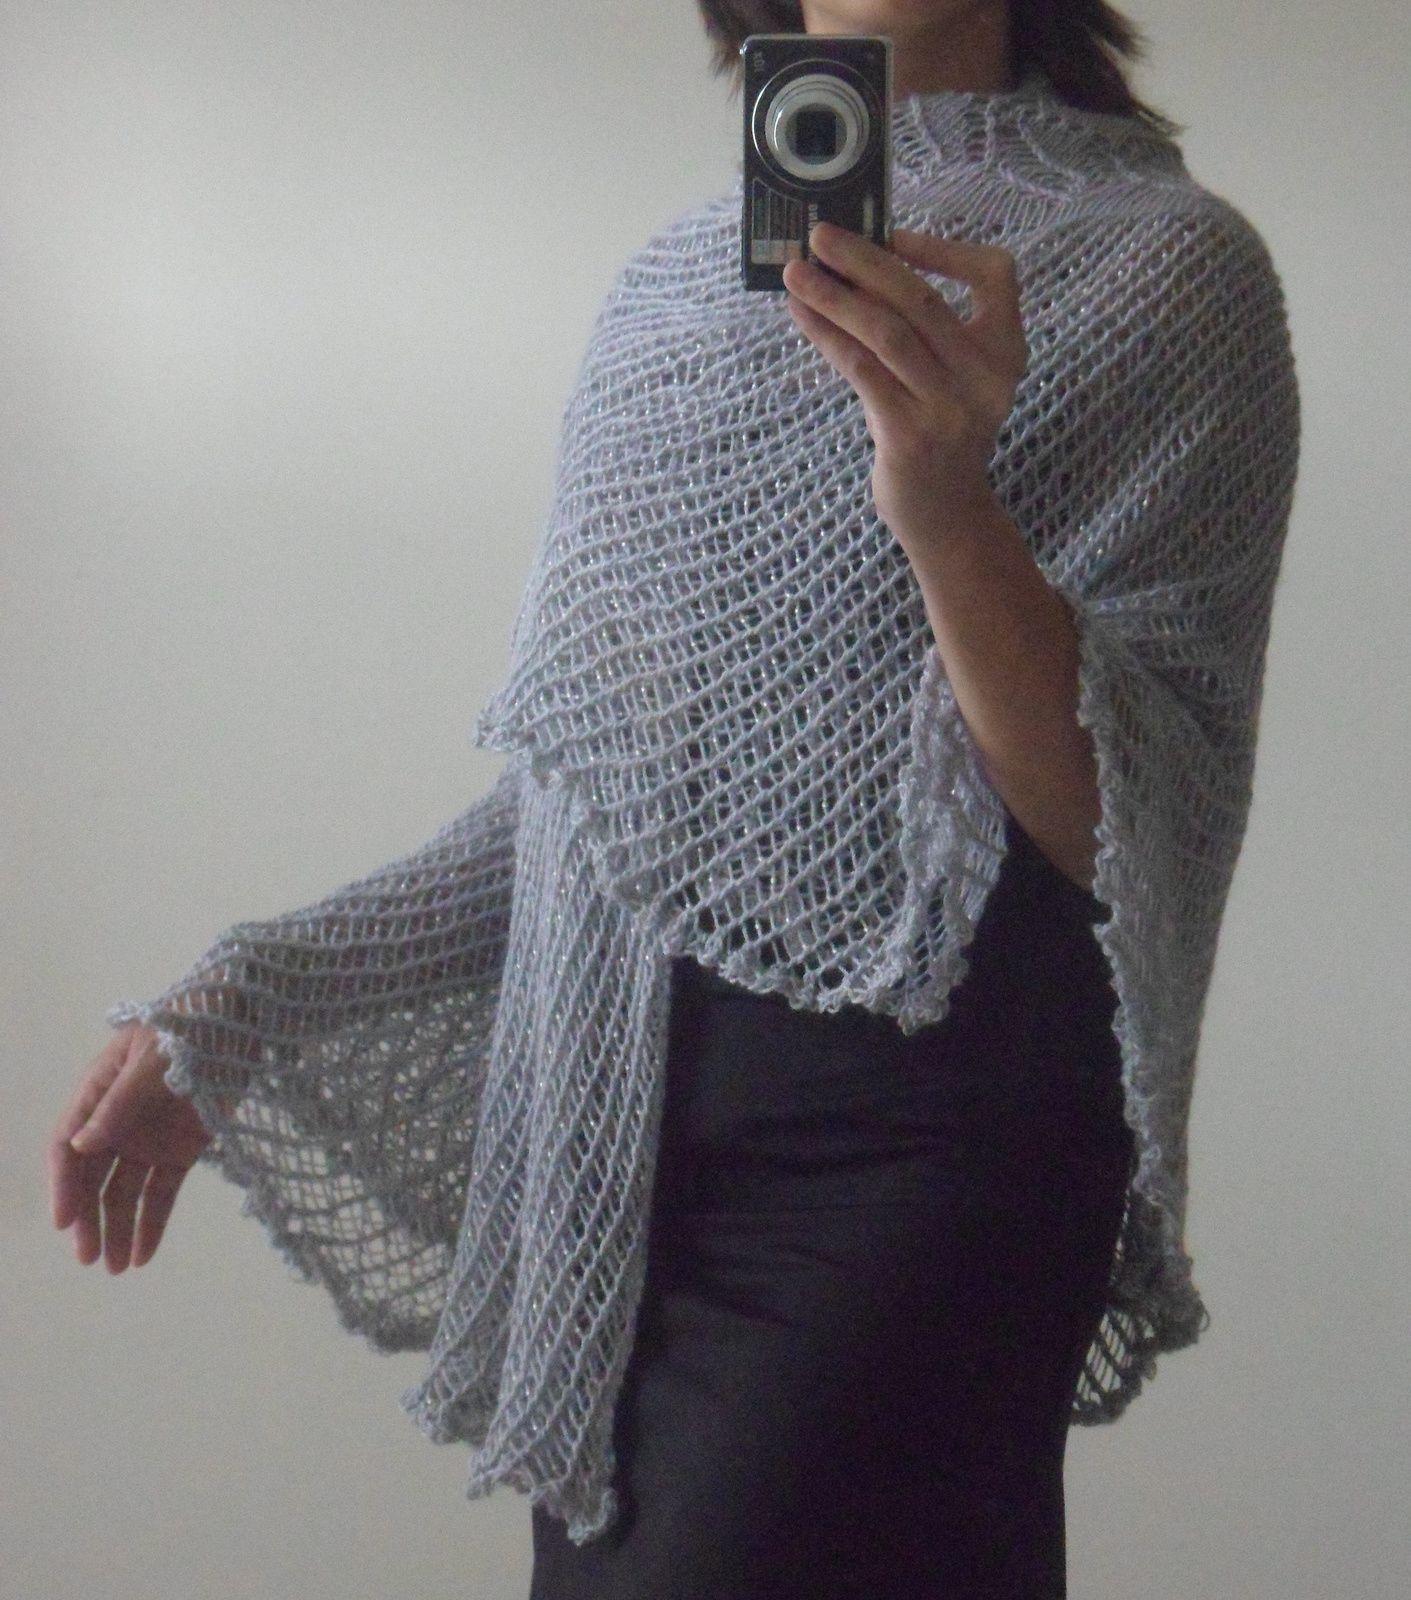 Shipwreck shawl